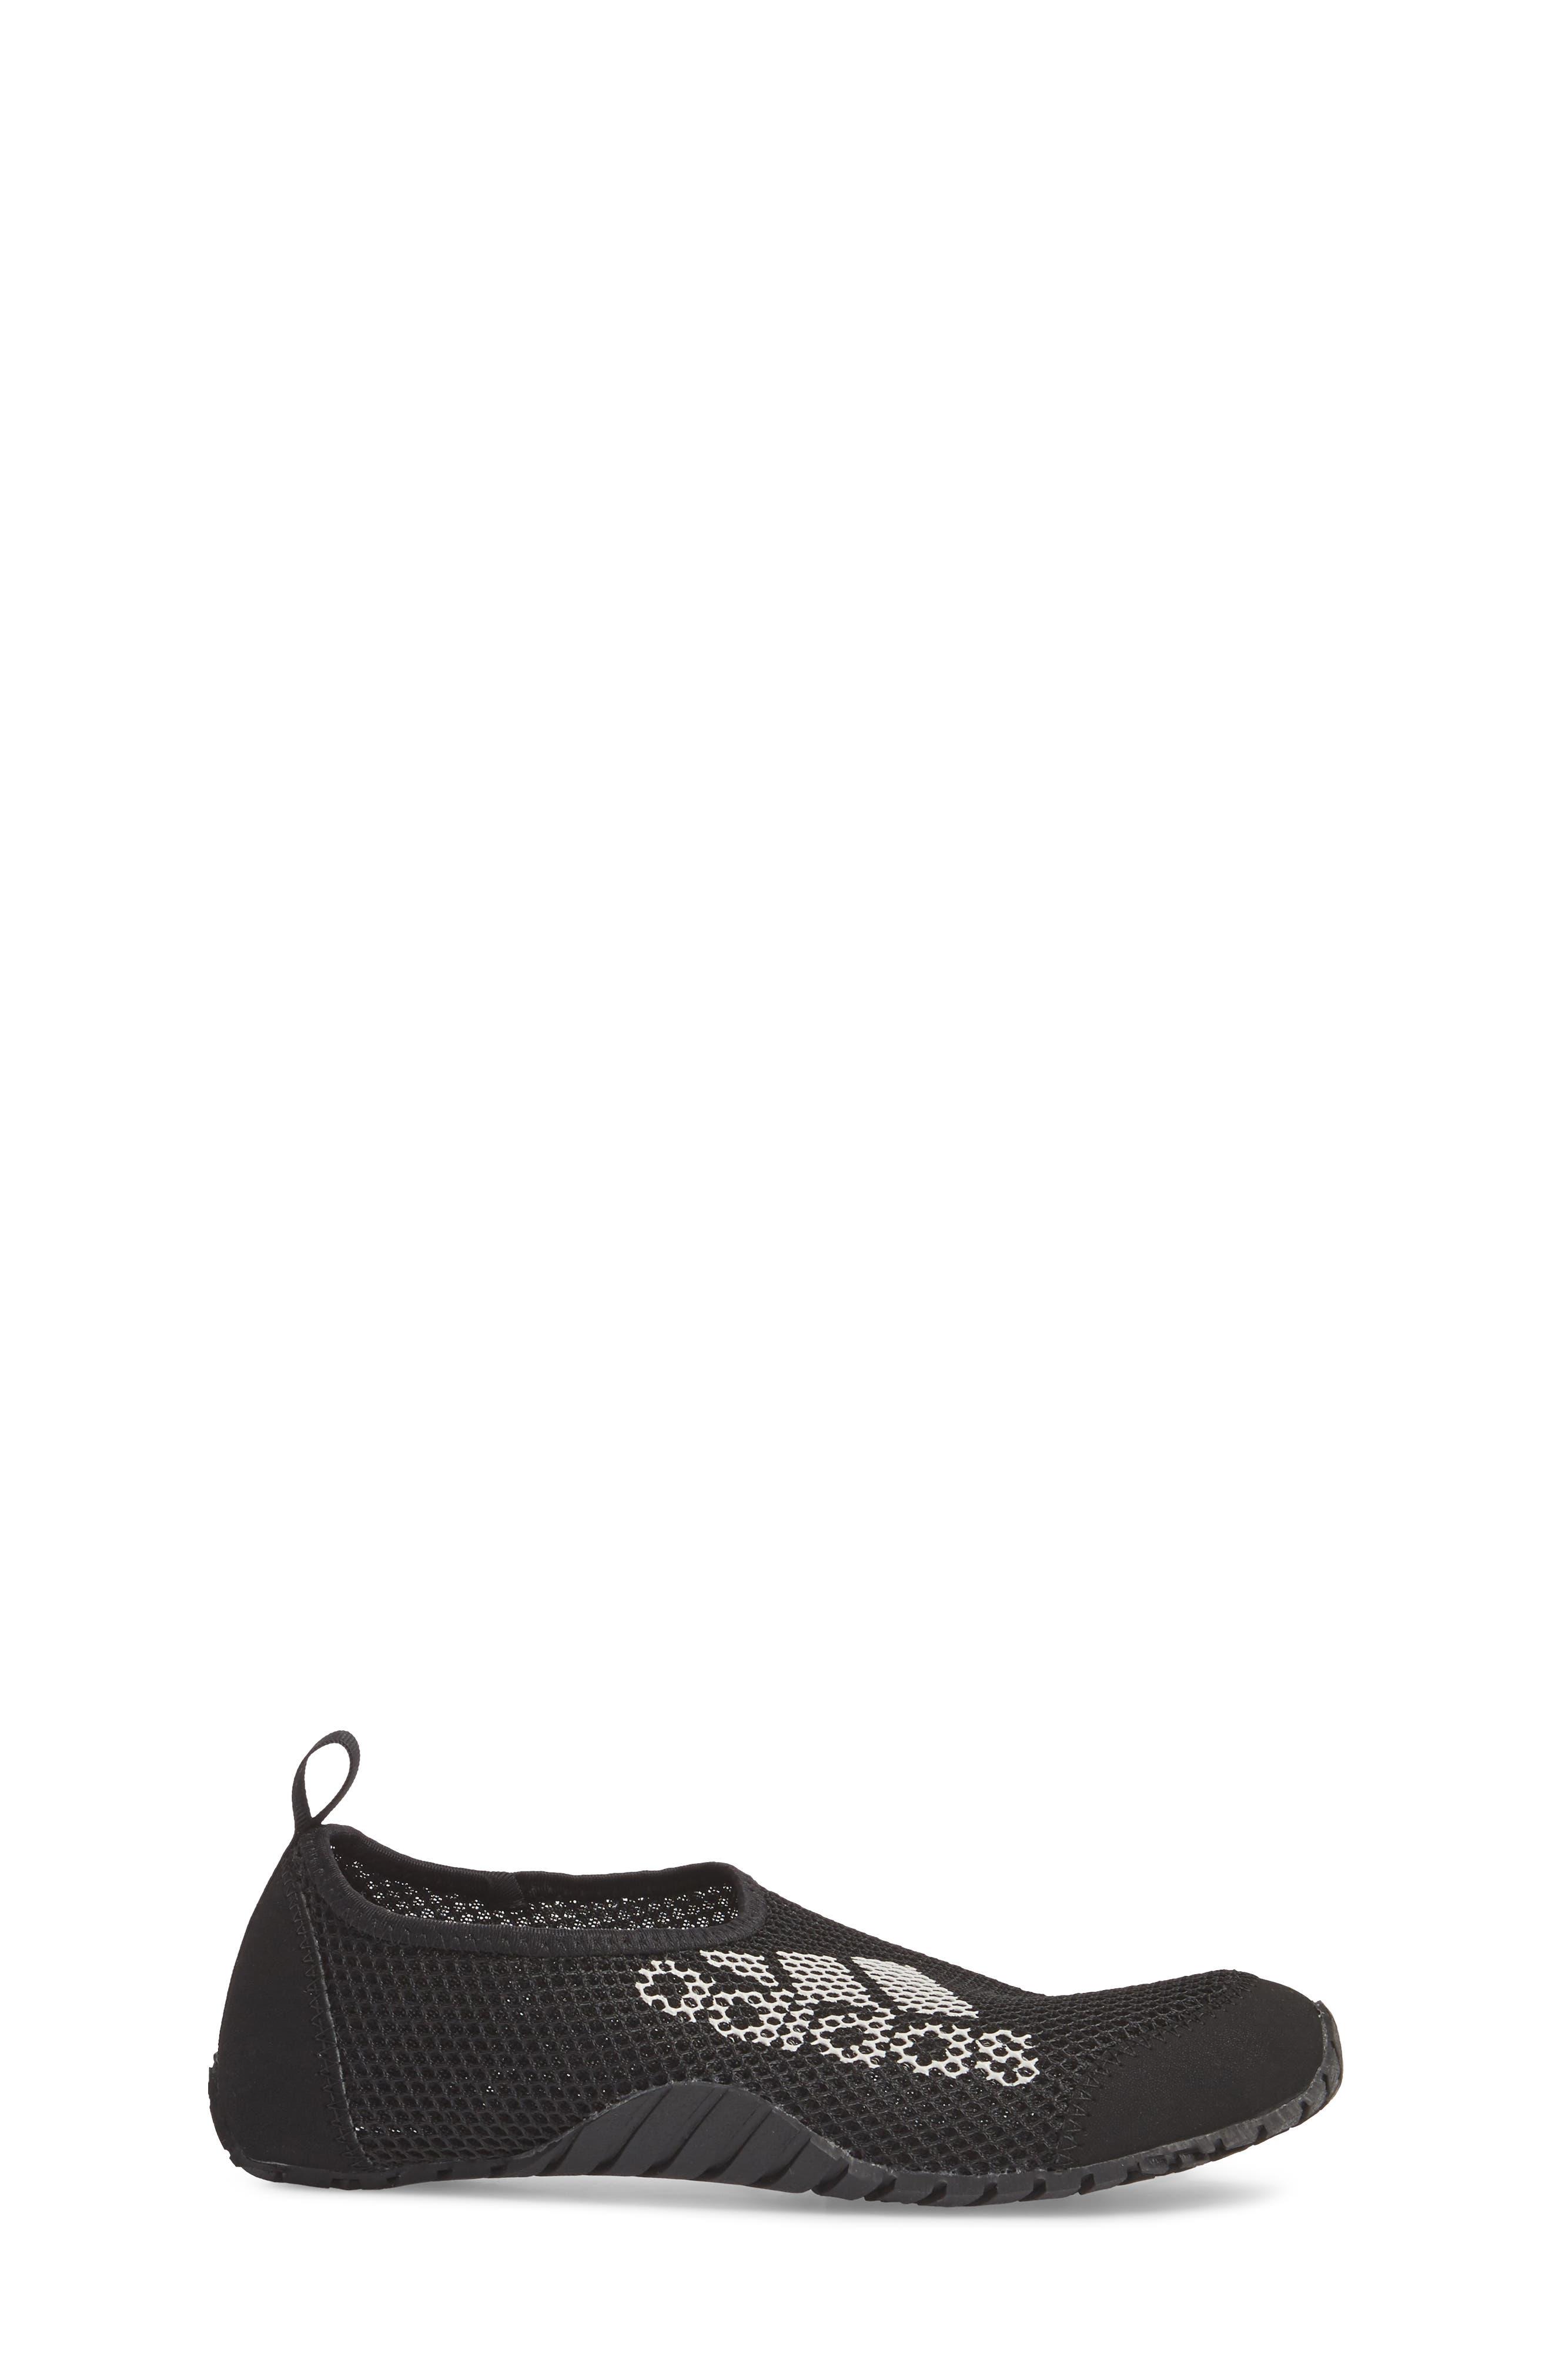 Kurobe Mesh Slip-On Water Shoe,                             Alternate thumbnail 3, color,                             BLACK/ BLACK GREY ONE